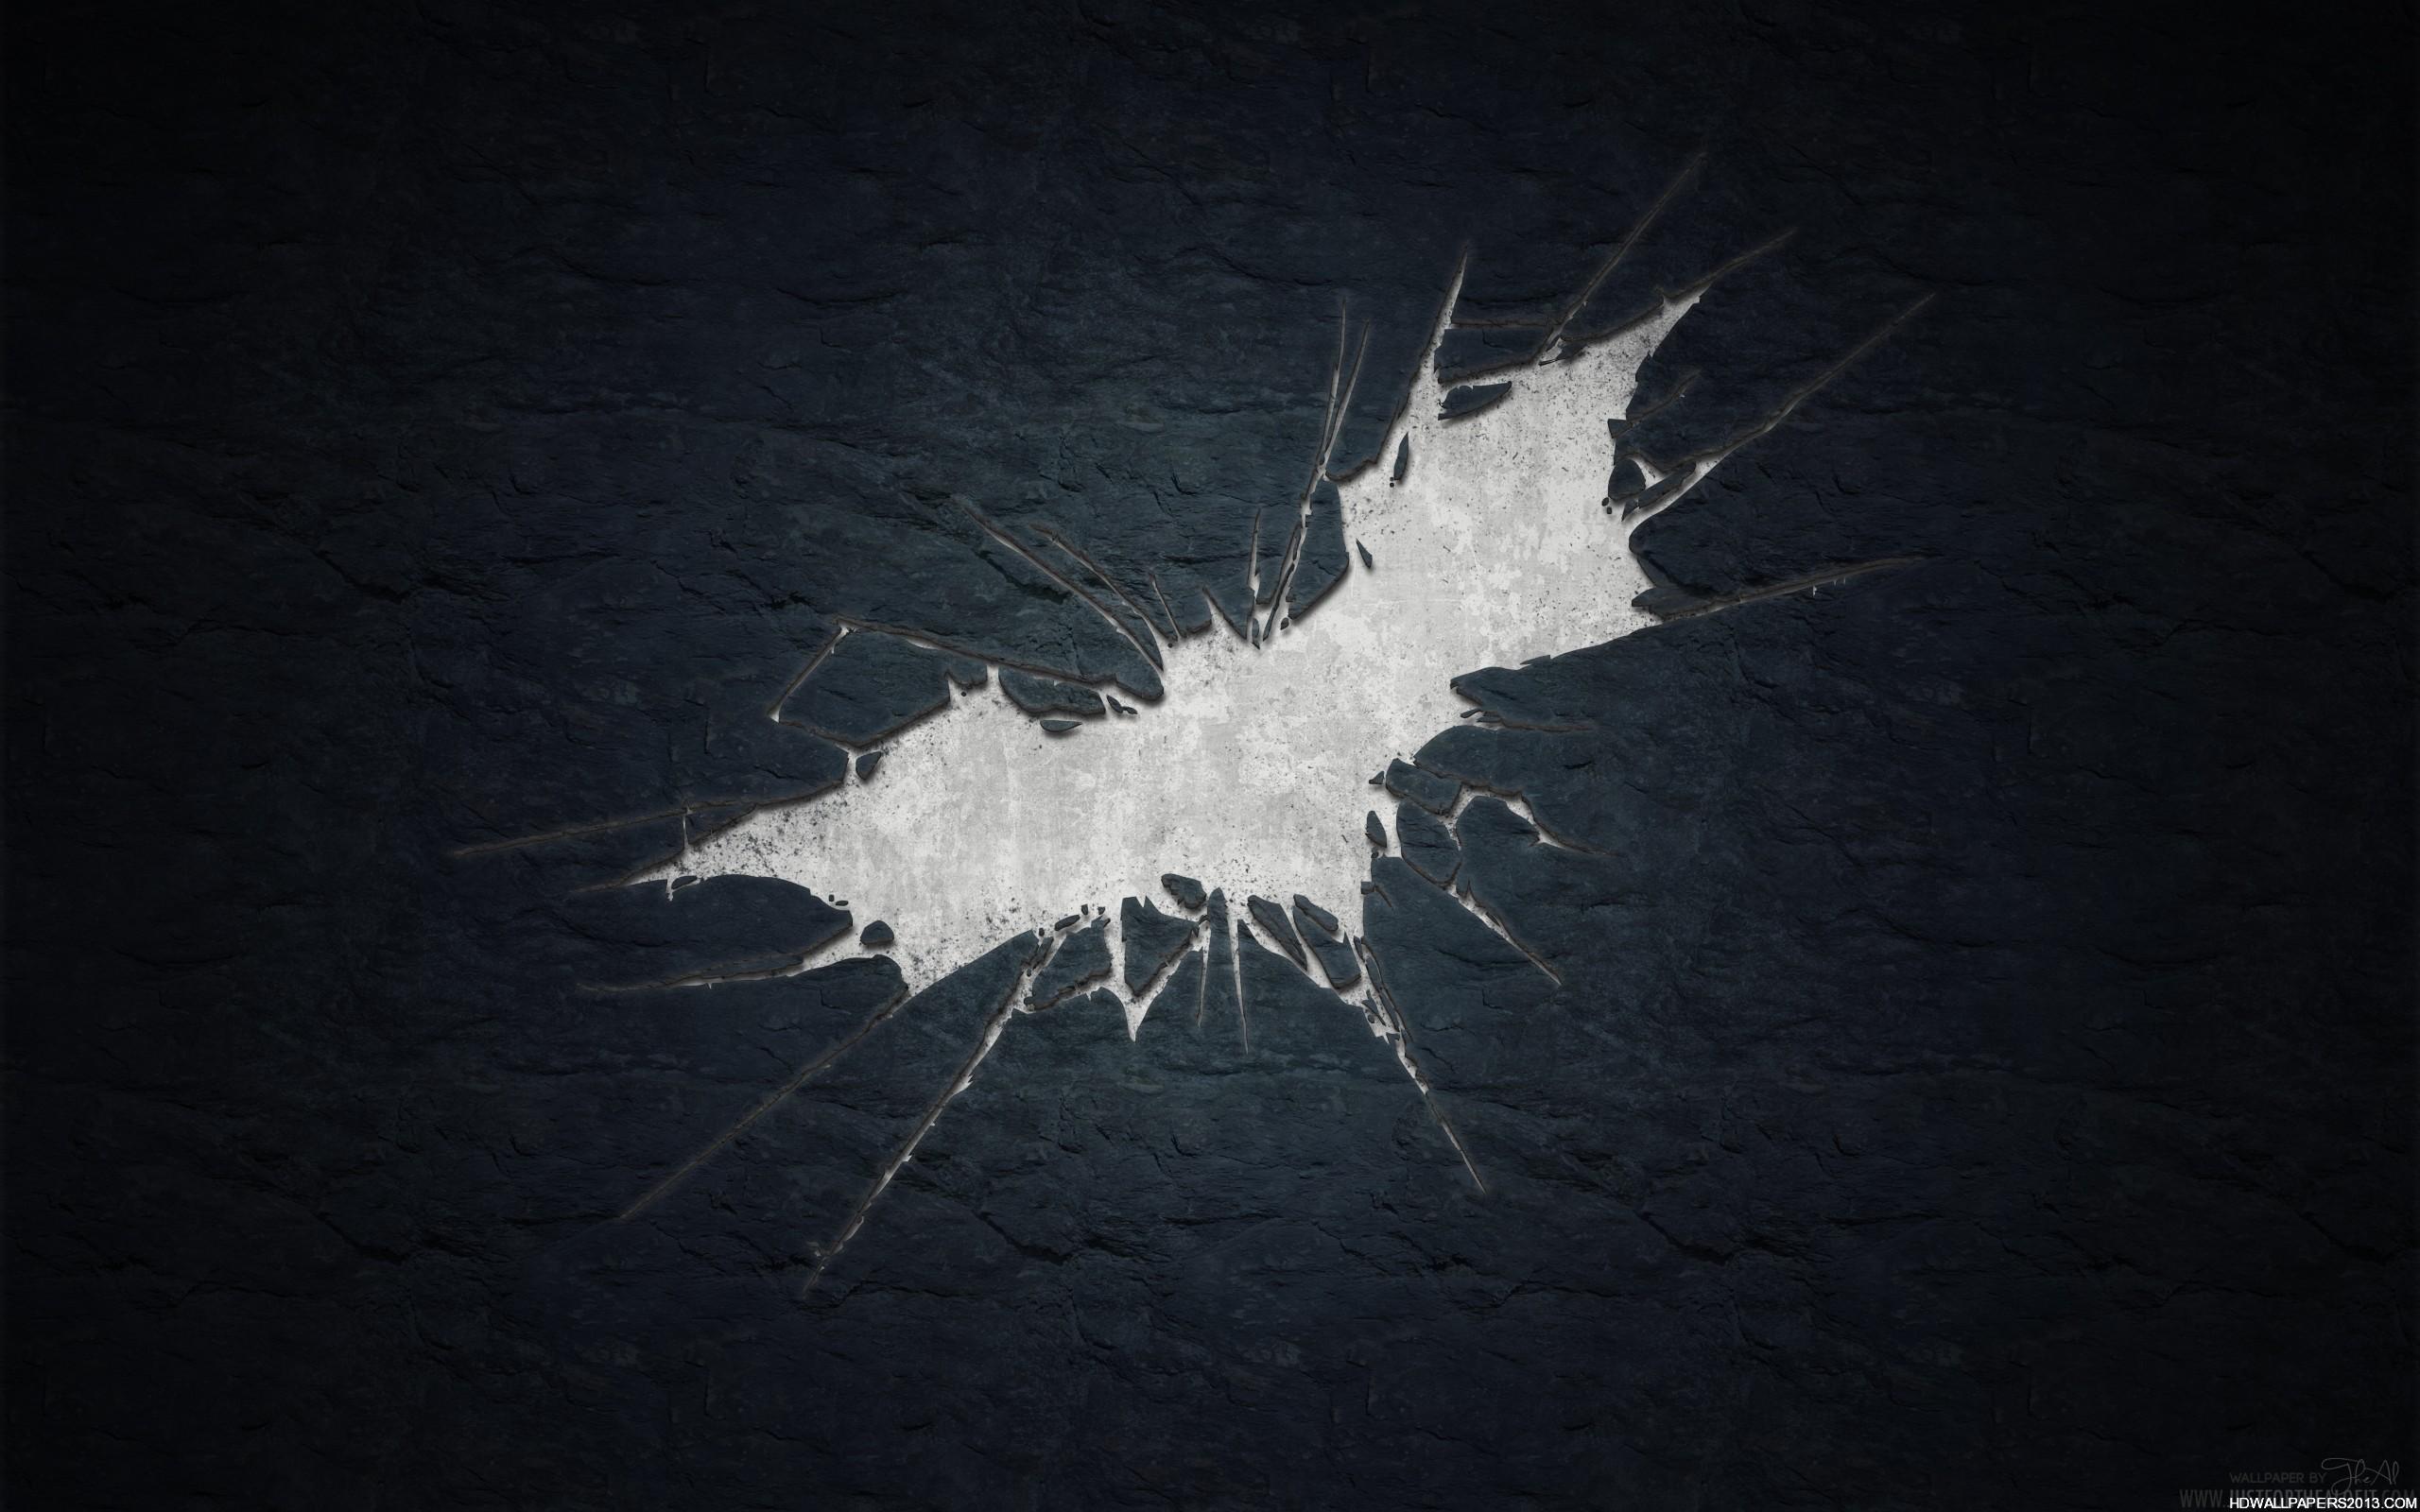 Hd wallpaper batman - Batman Logo Wallpaper High Definition Wallpapers High Definition